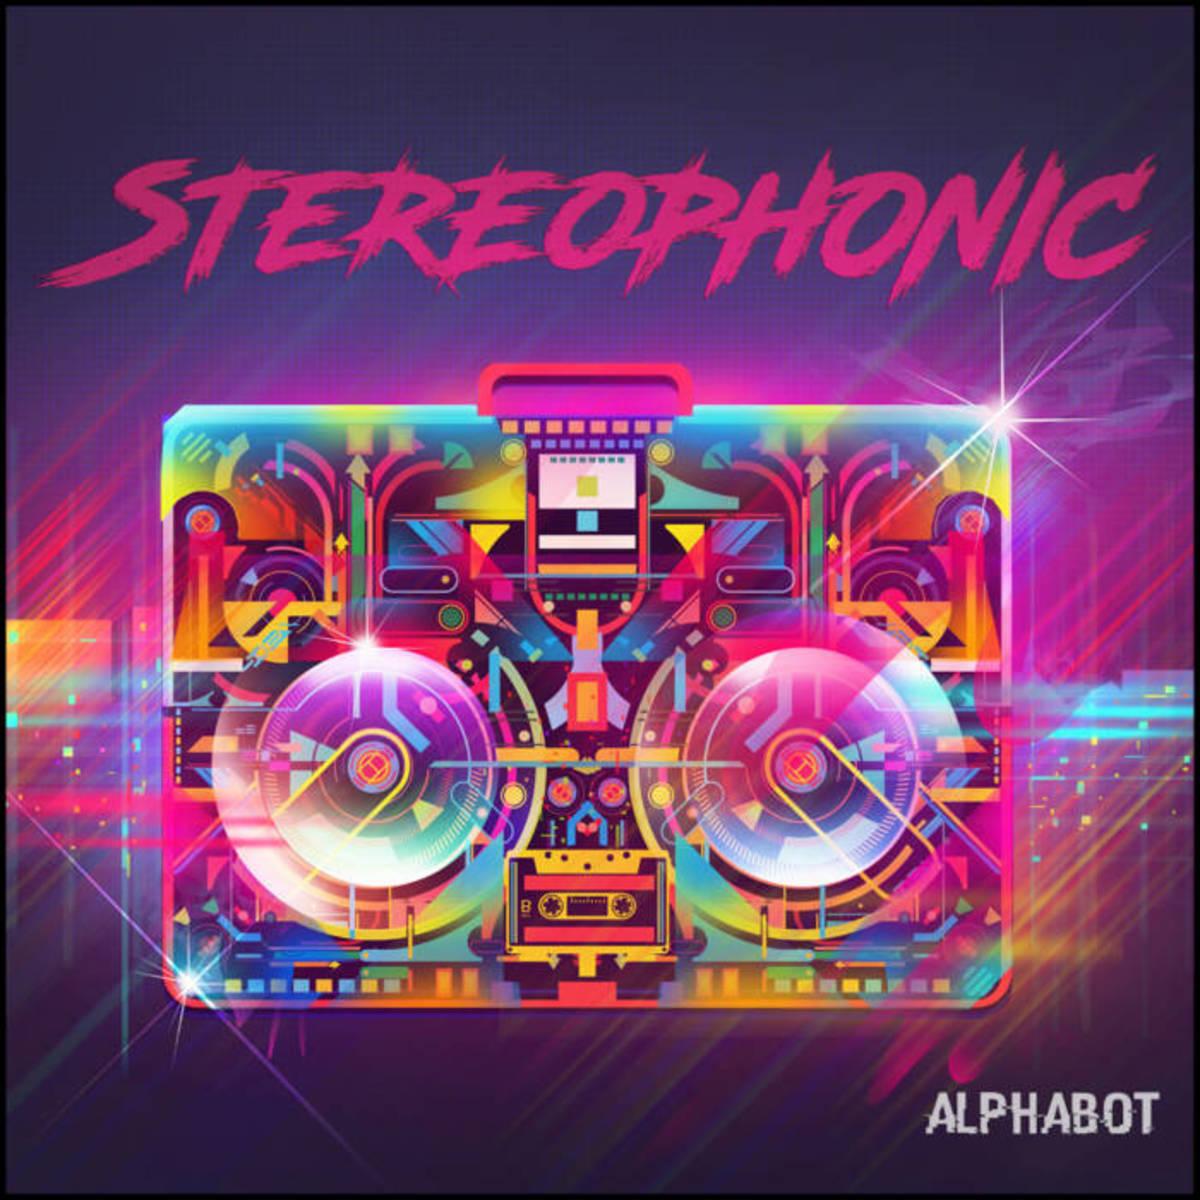 "Artwork for Alphabot's new single, ""Stereophonic"""